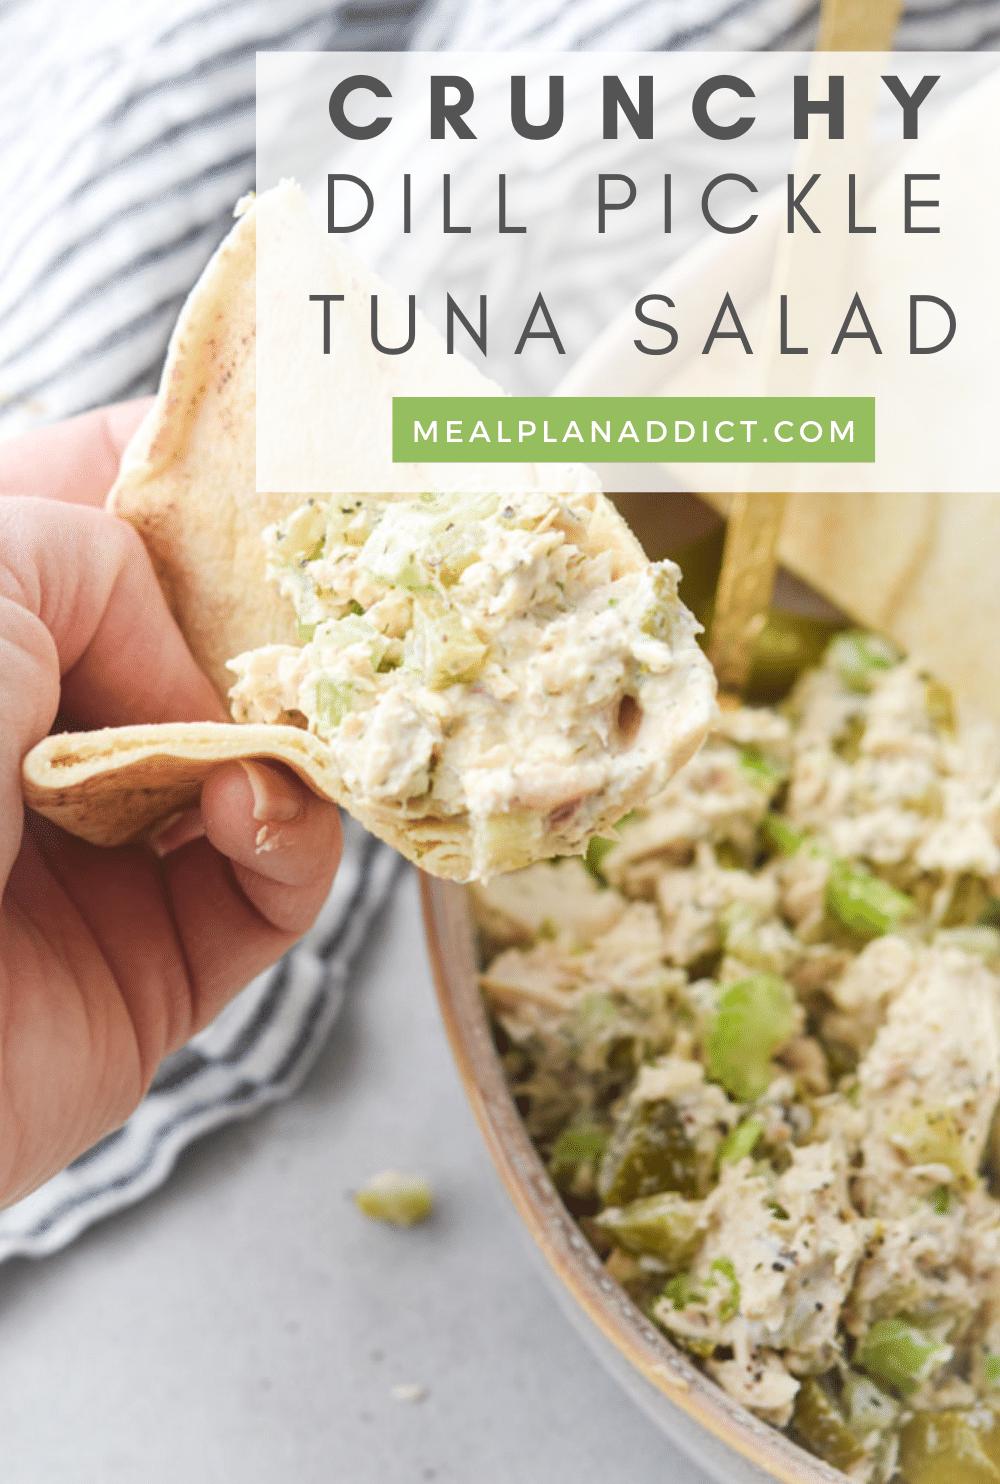 Tuna salad pin for Pinterest